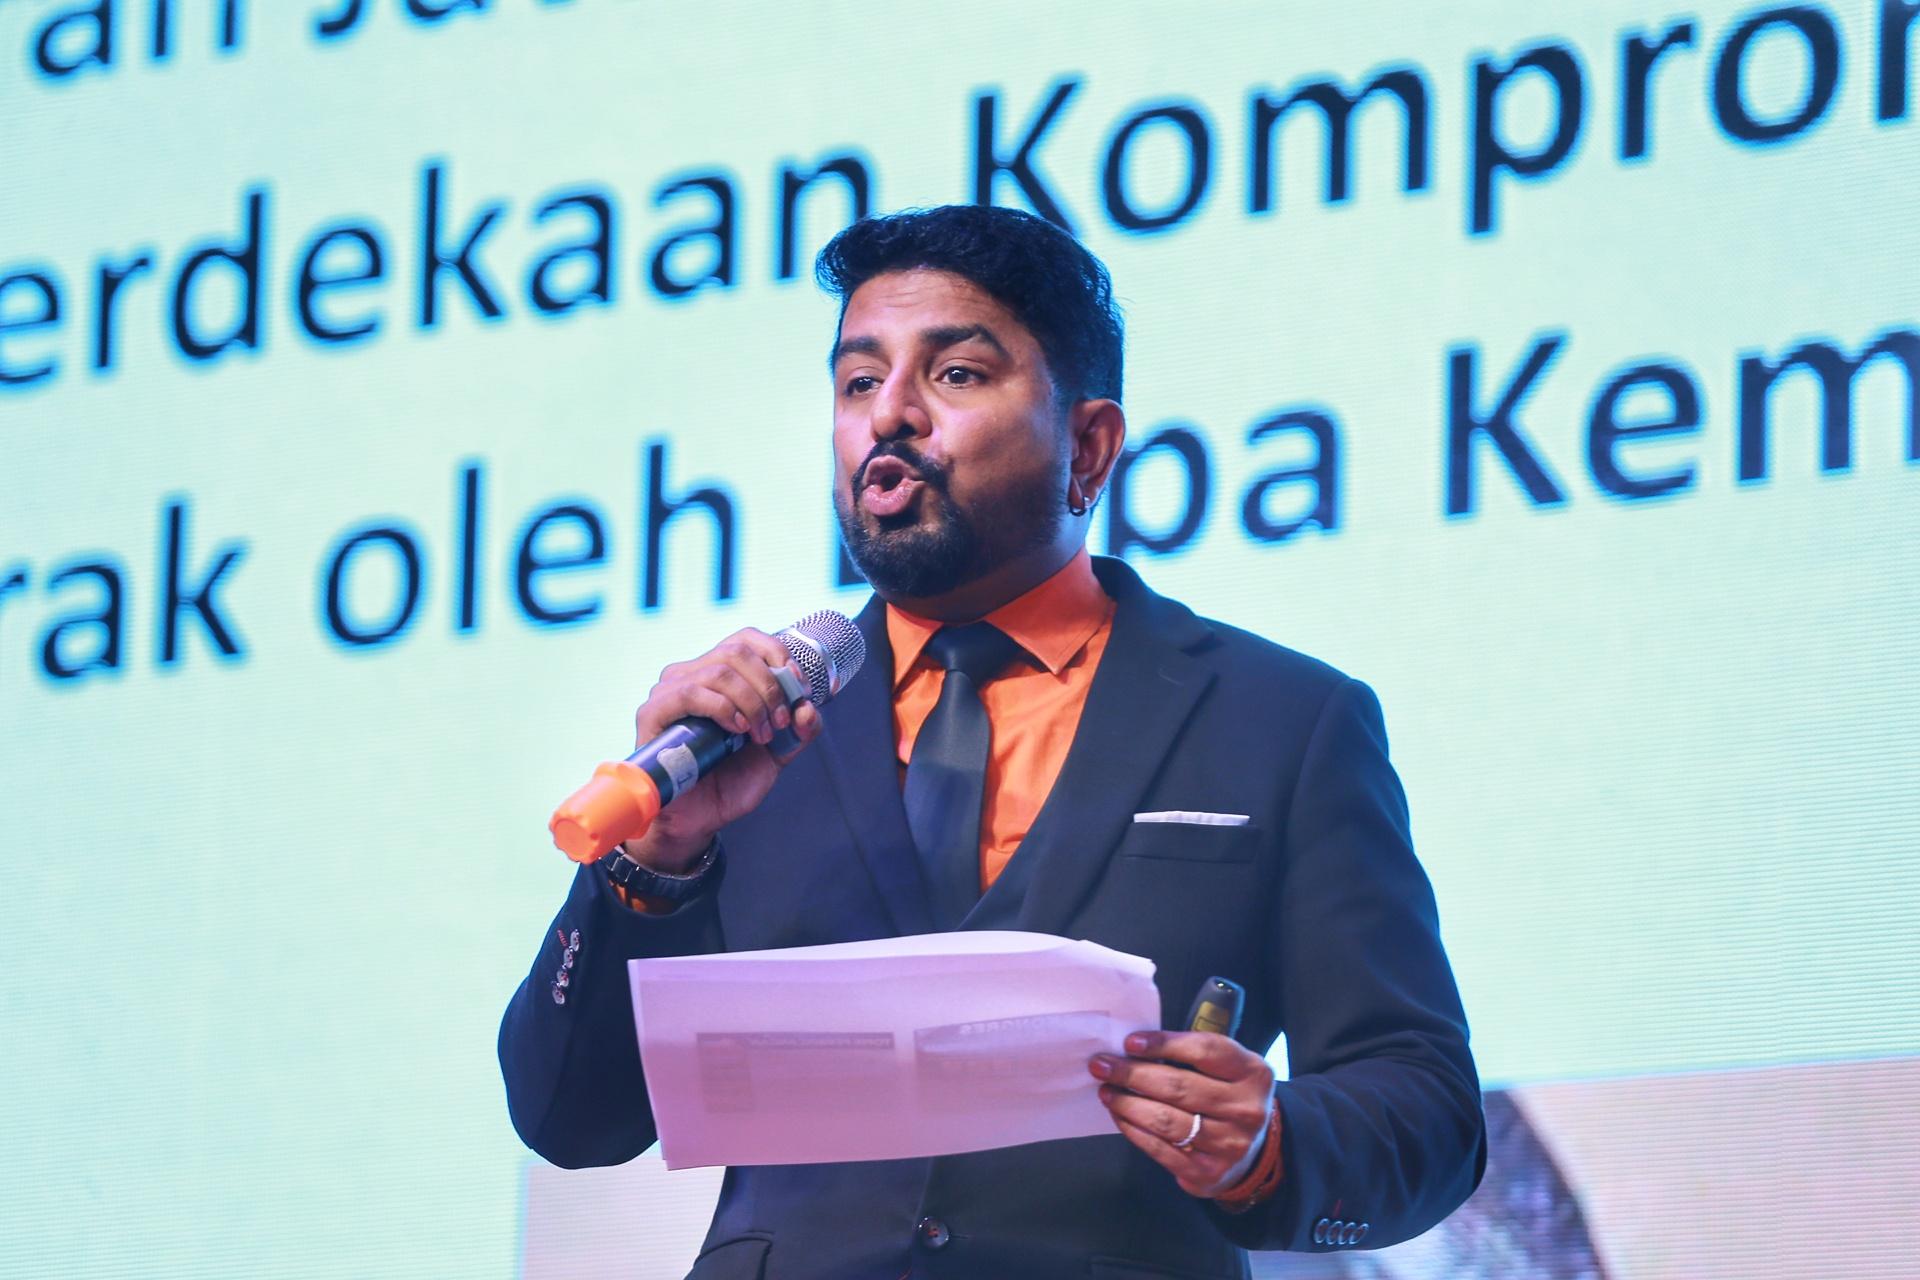 Arun Doraisamy speaks during the National Jawi Congress in Petaling Jaya December 29, 2019. — Picture by Ahmad Zamzahuri